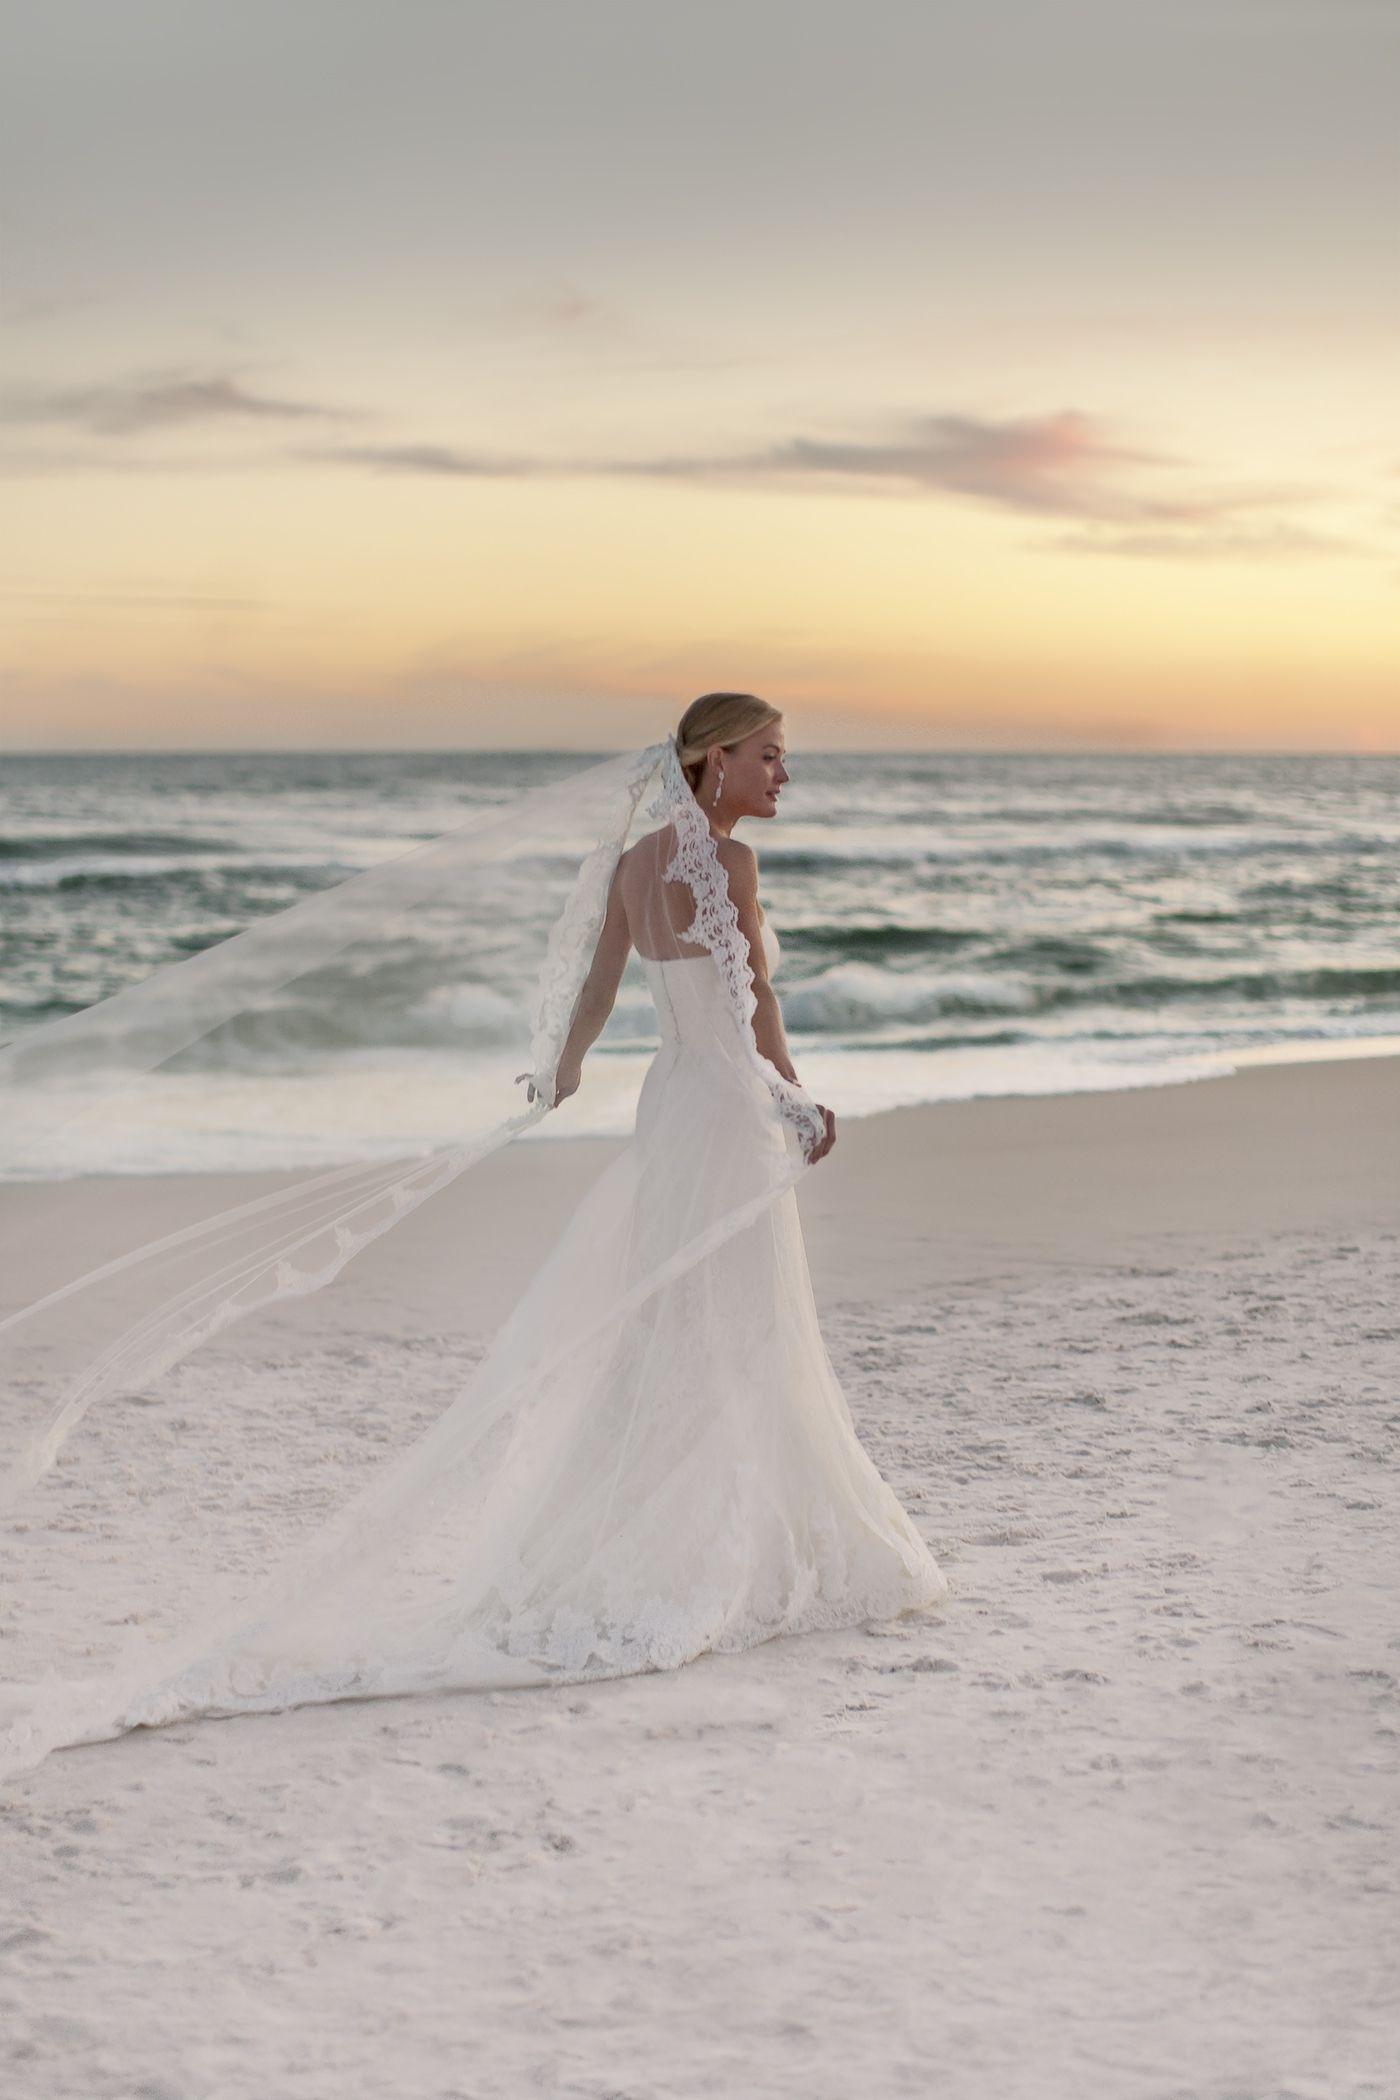 Rosemary Beach Blog Leslee Mitchell Beach Wedding Pics Beach Wedding Photographer Beach Bridesmaid Dresses